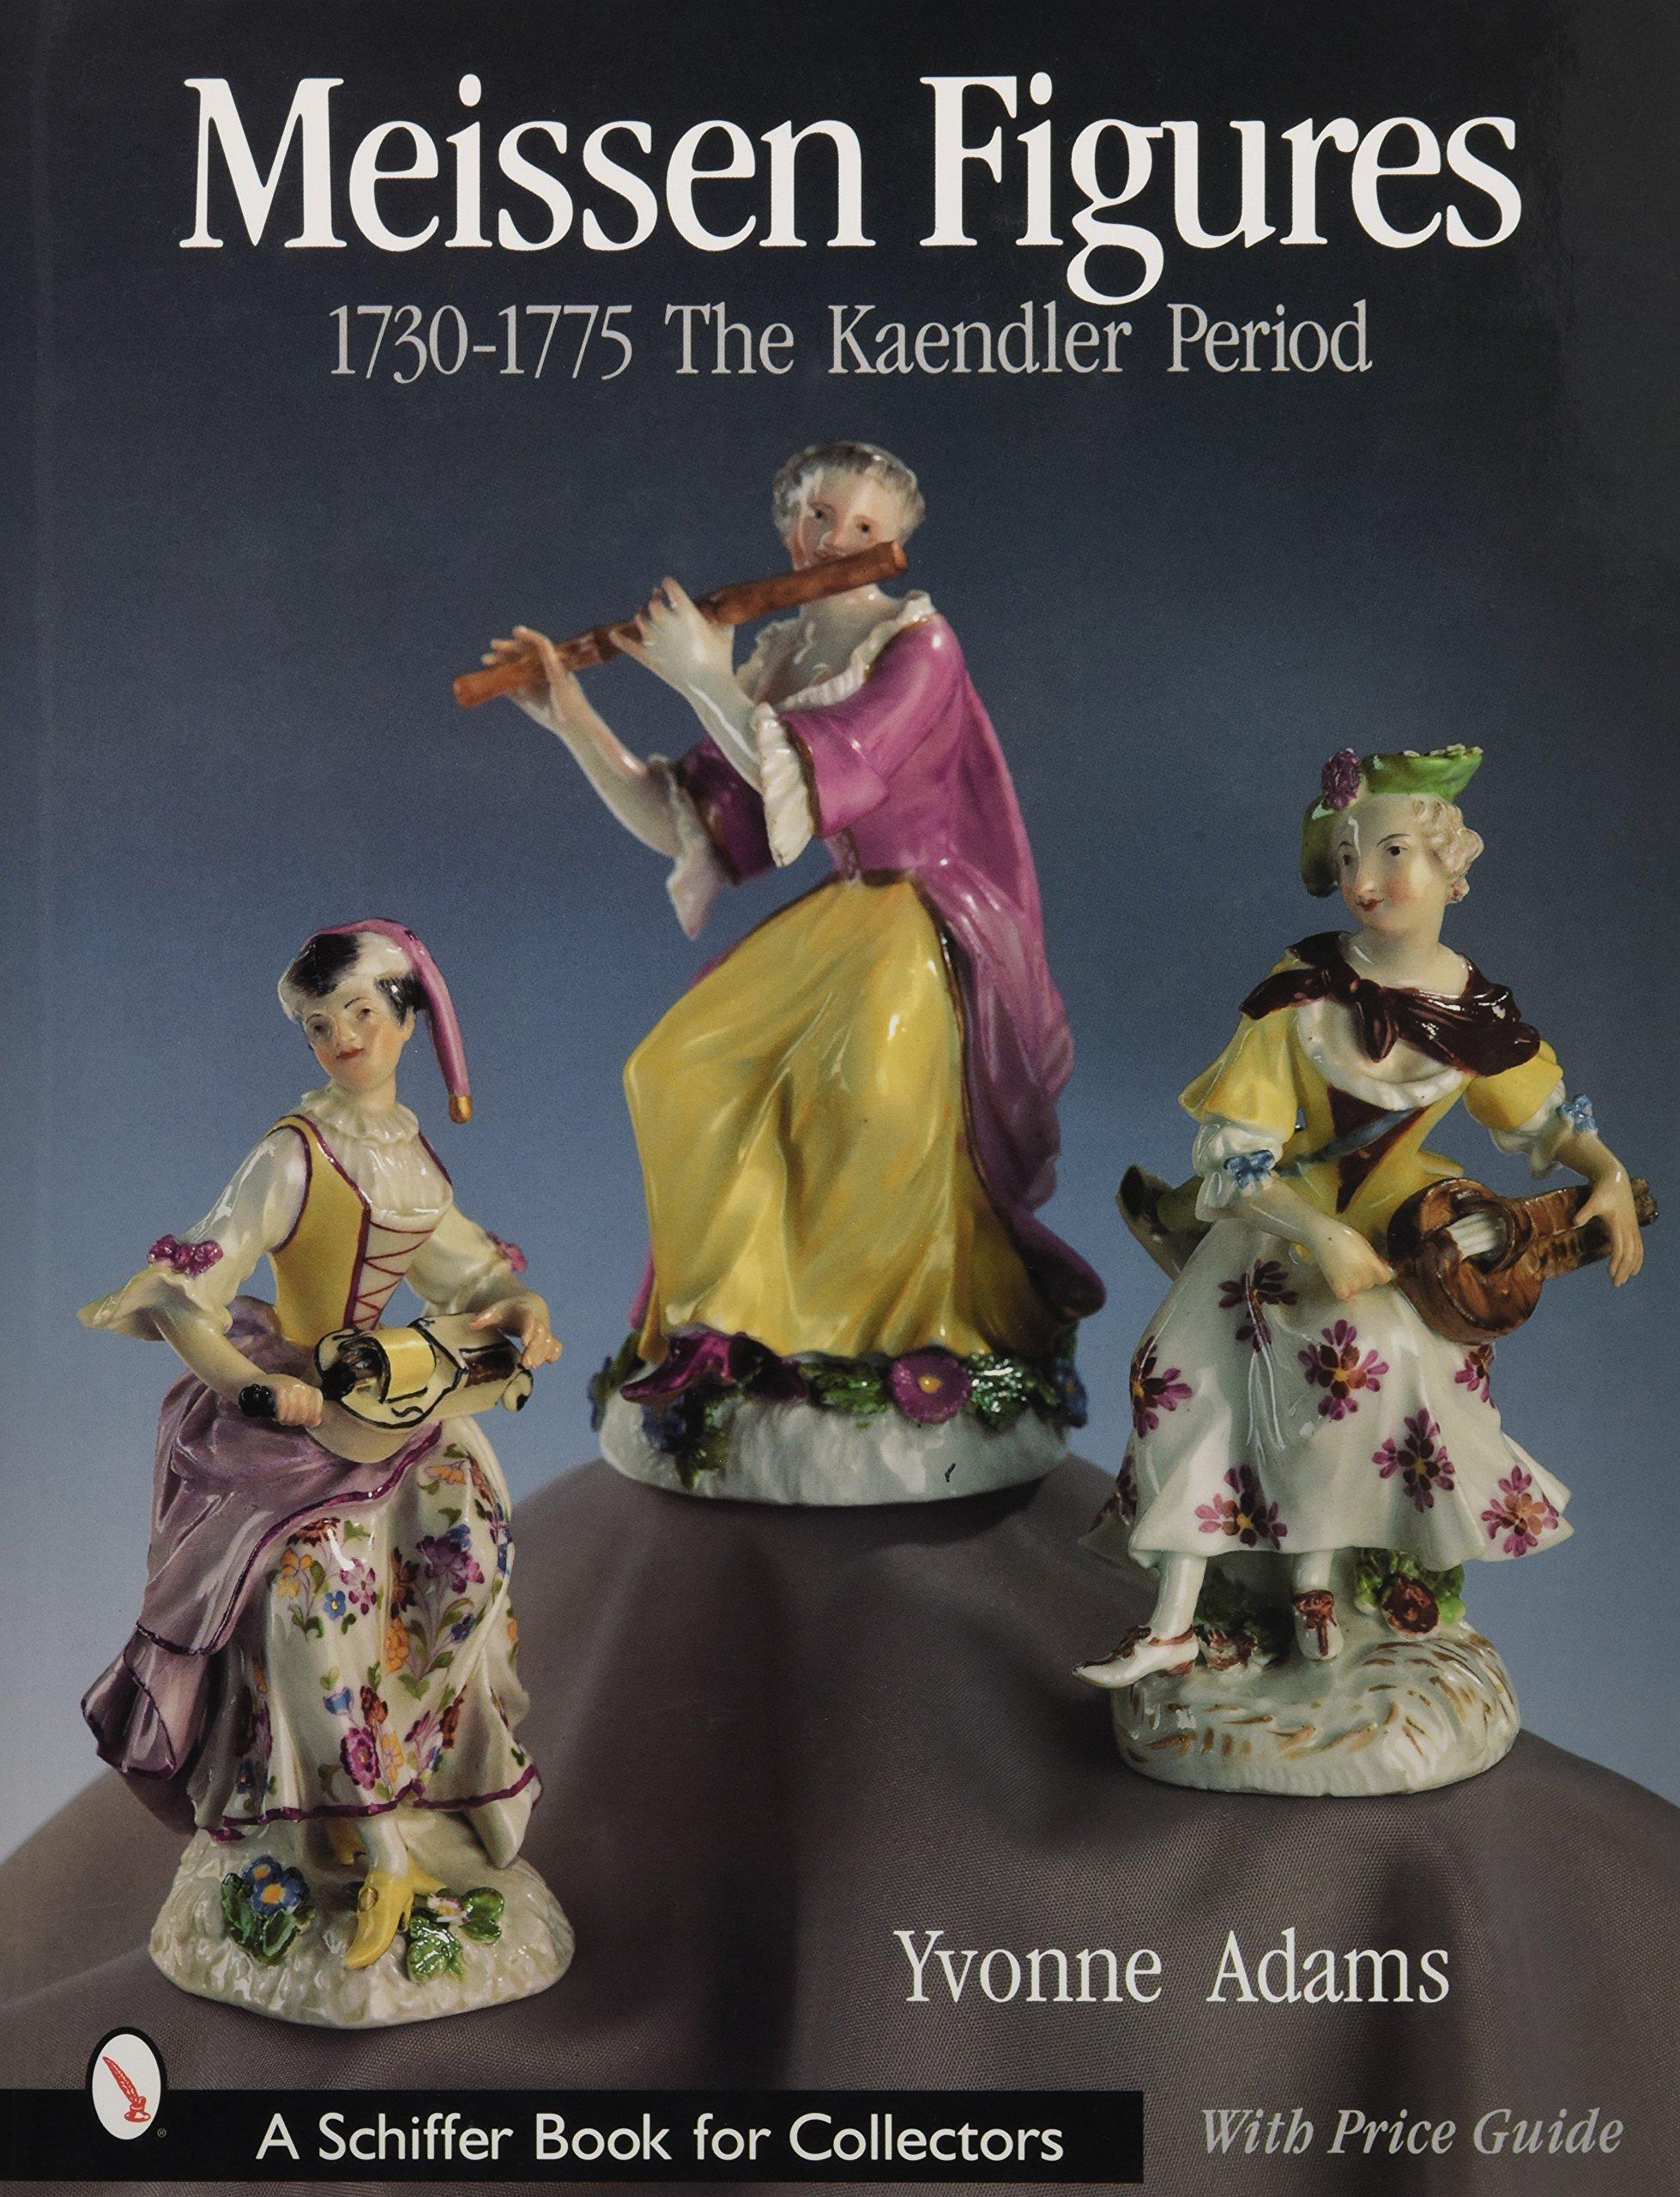 Meissen Figures 1730-1775: The Kaendler Period (Schiffer Book for Collectors)